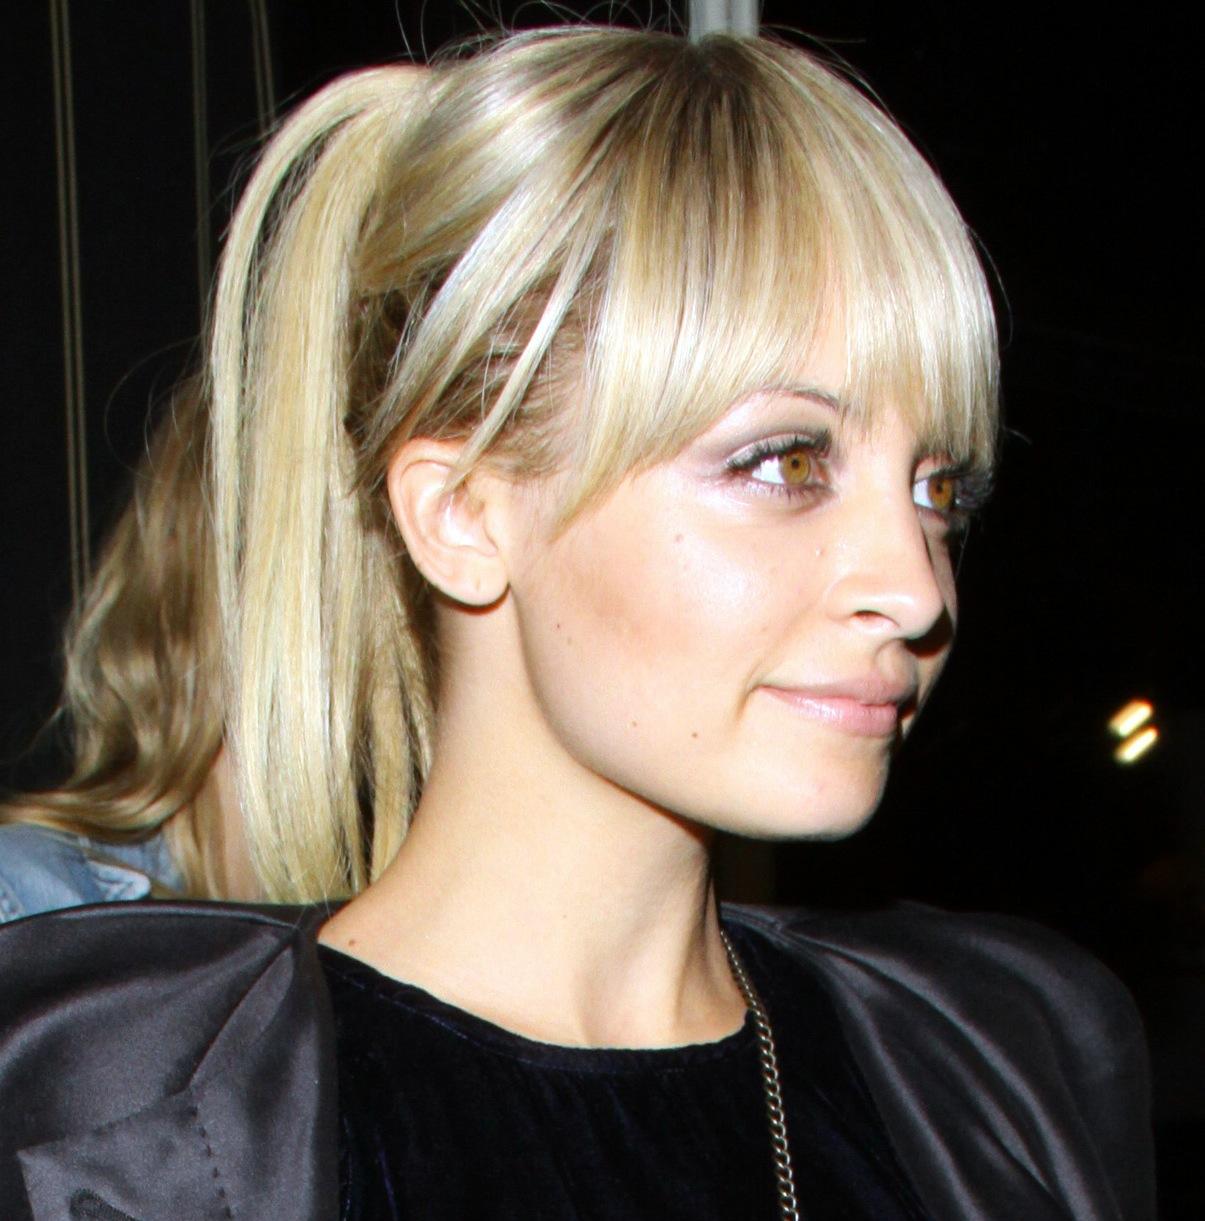 http://4.bp.blogspot.com/-K-764QgZ_M8/TlVWohzqXdI/AAAAAAAAJkY/MkhpaTG826s/s1600/nicole-richie-60s-hair.jpg